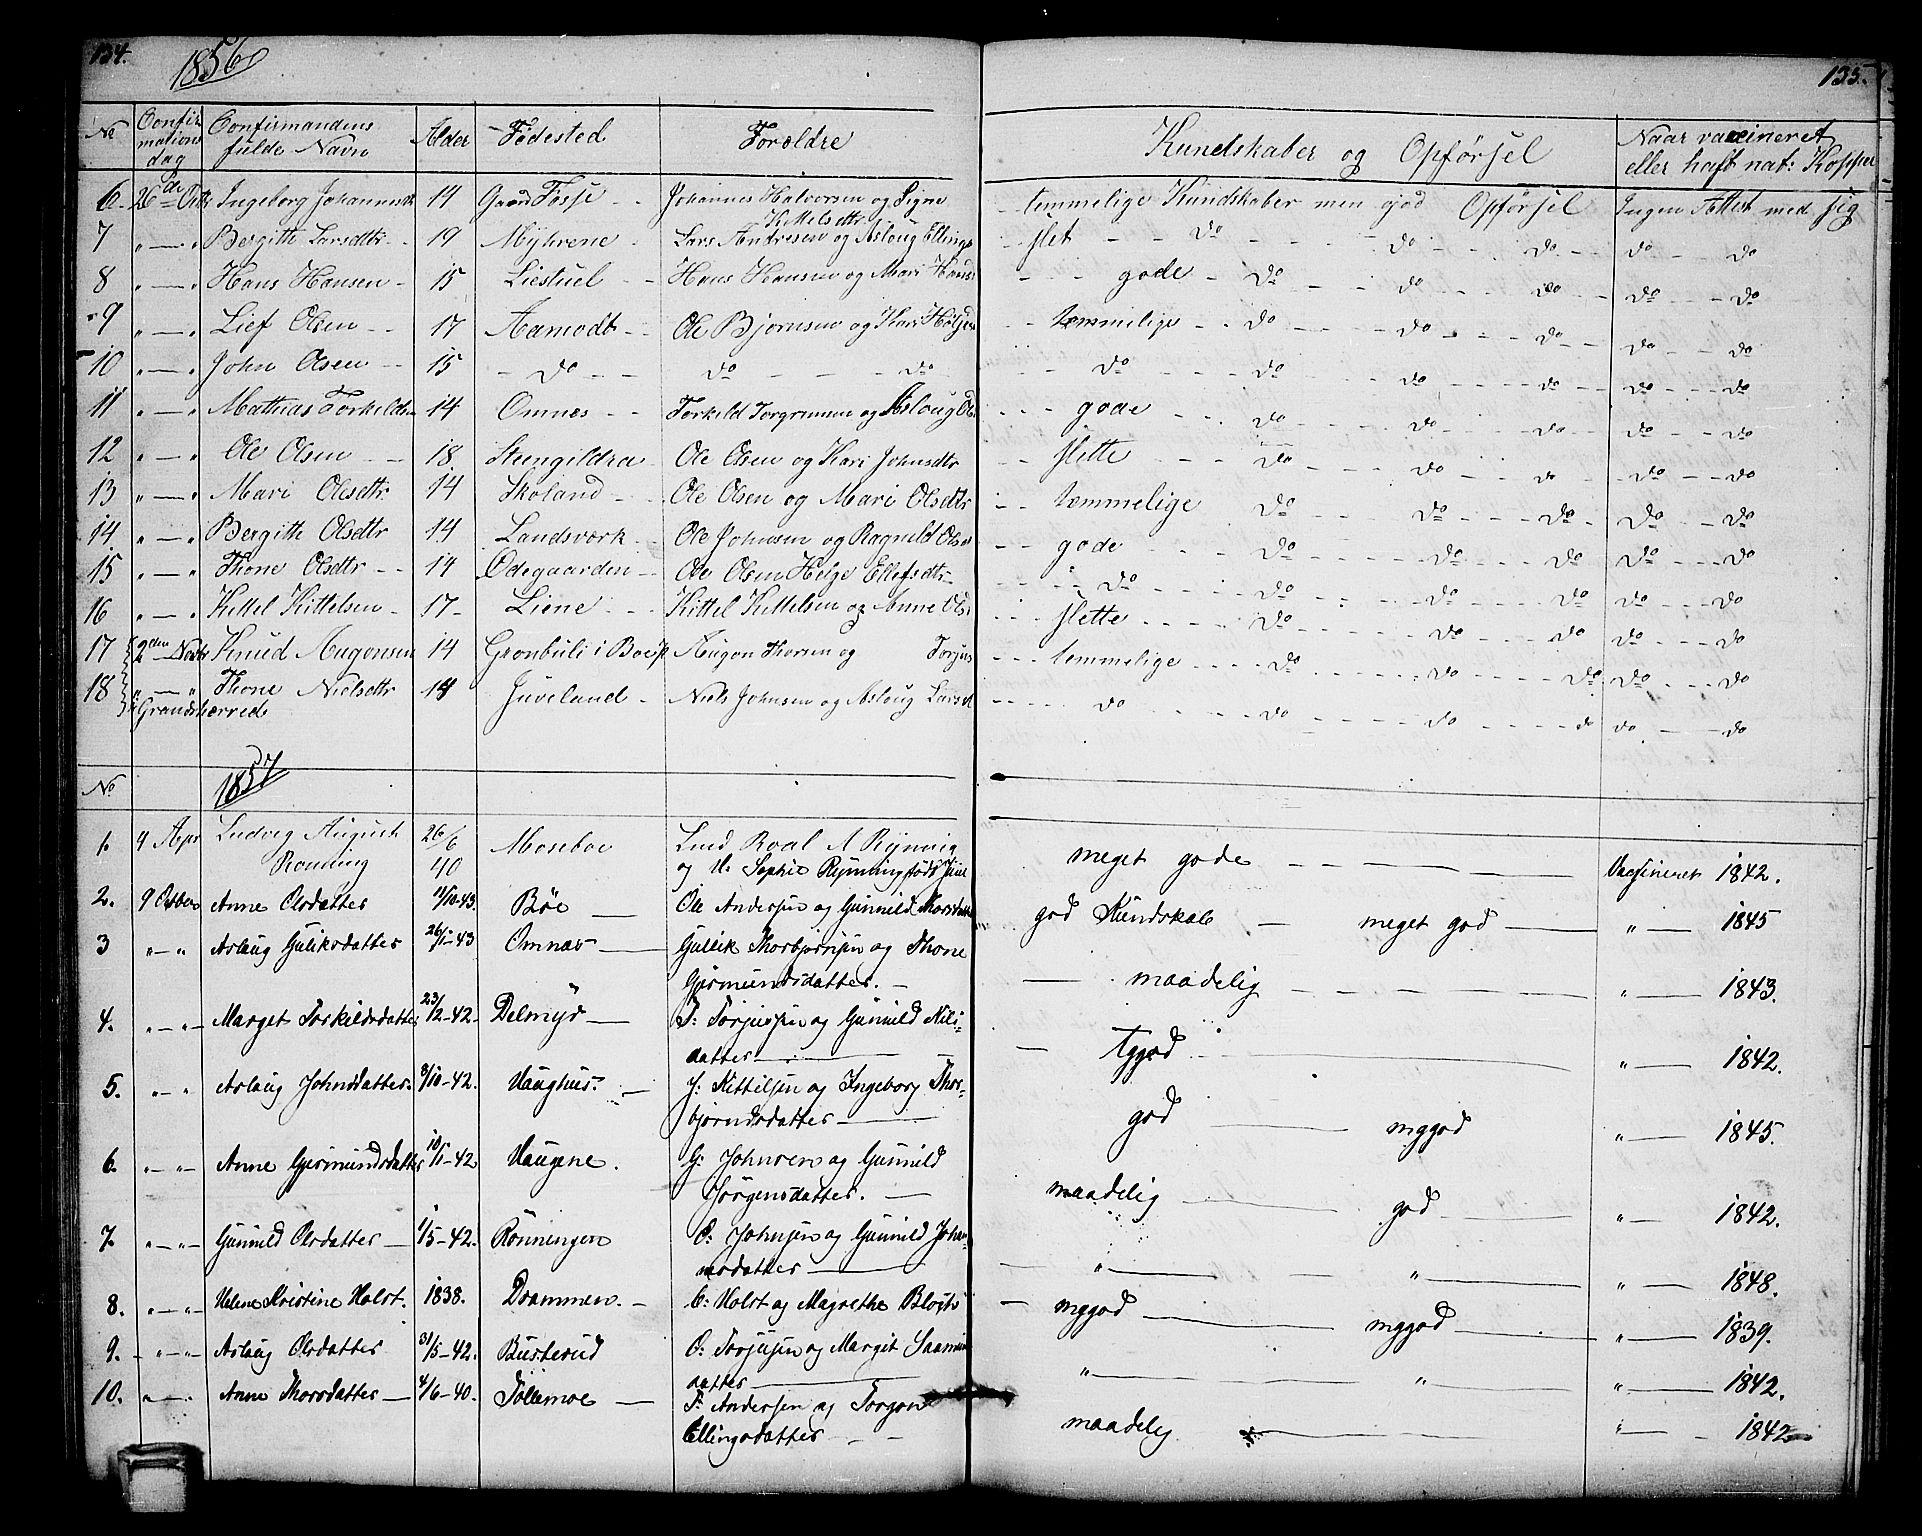 SAKO, Hjartdal kirkebøker, G/Gb/L0002: Klokkerbok nr. II 2, 1854-1884, s. 134-135